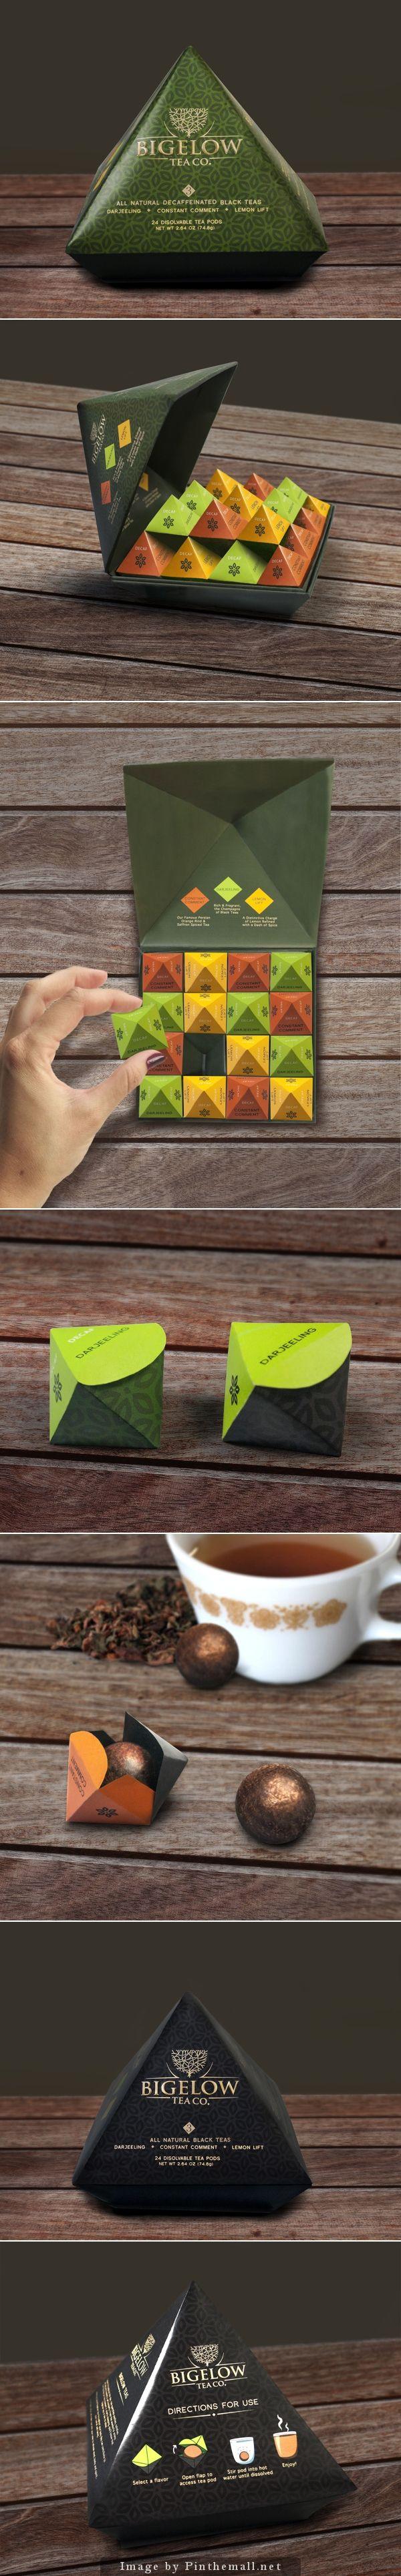 Bigelow Tea Rebrand (student work by Brielle Wilson) -